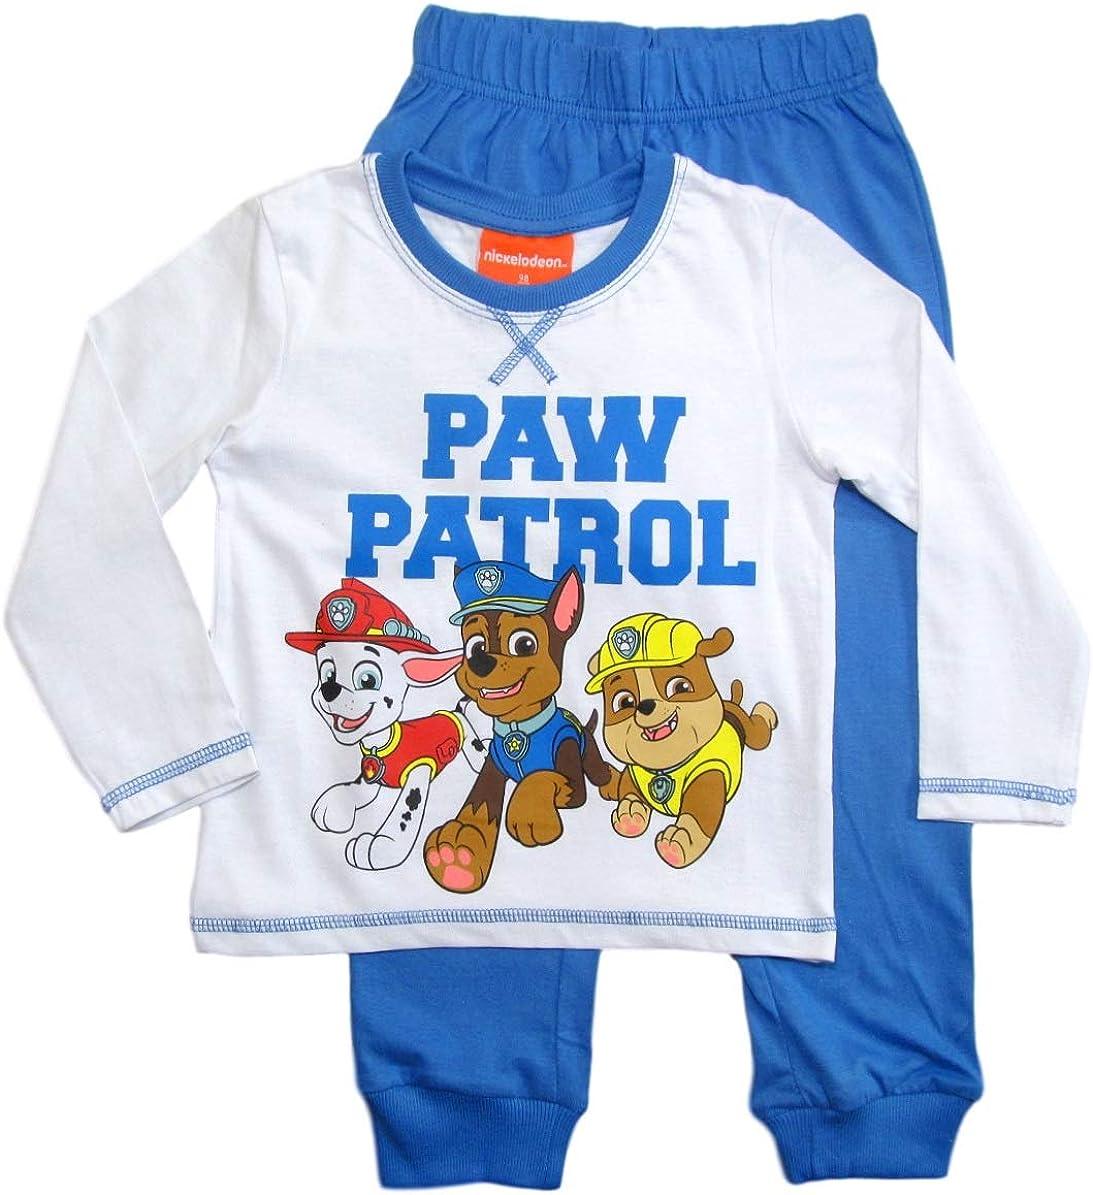 PAW PATROL Schlafanzug Jungen Pyjama Schlafanzug Lang